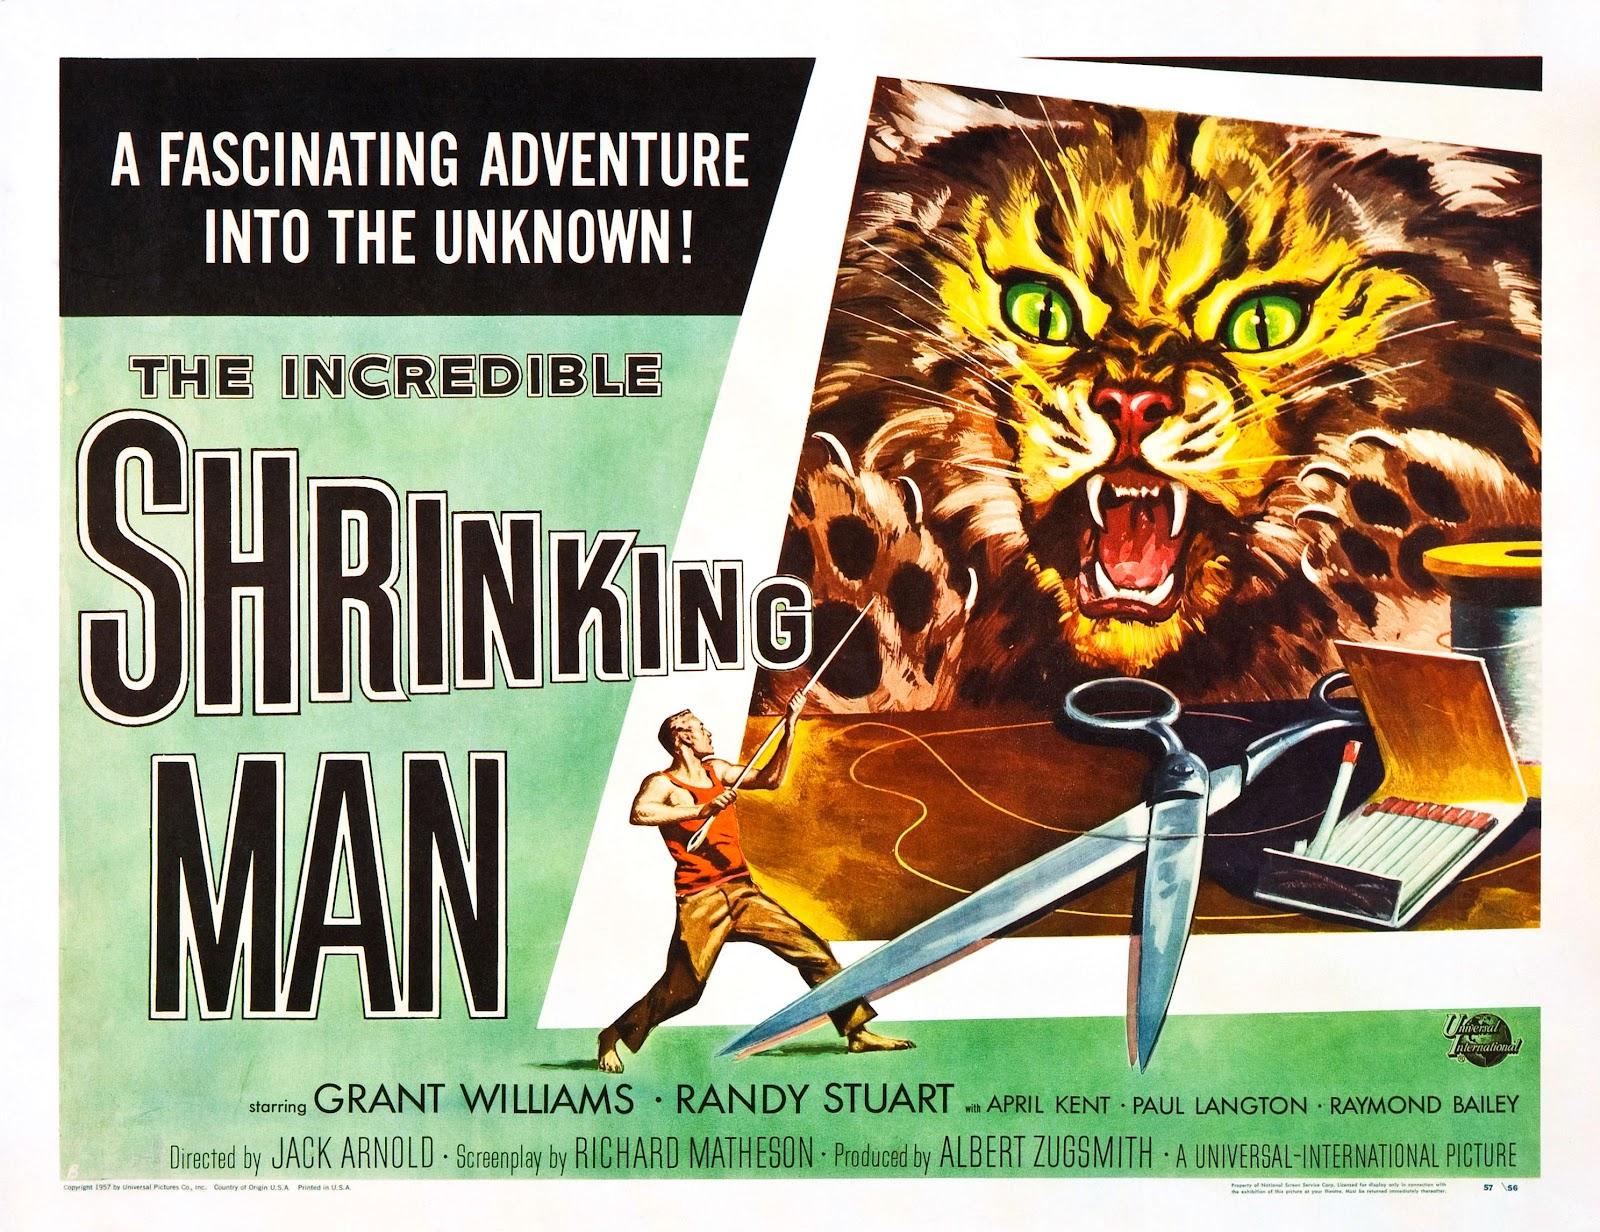 http://4.bp.blogspot.com/-GXBqClw45RY/UFGdLm8Tn0I/AAAAAAABEVw/5usNrtFV1x4/s1600/incredible_shrinking_man_poster_03.jpg